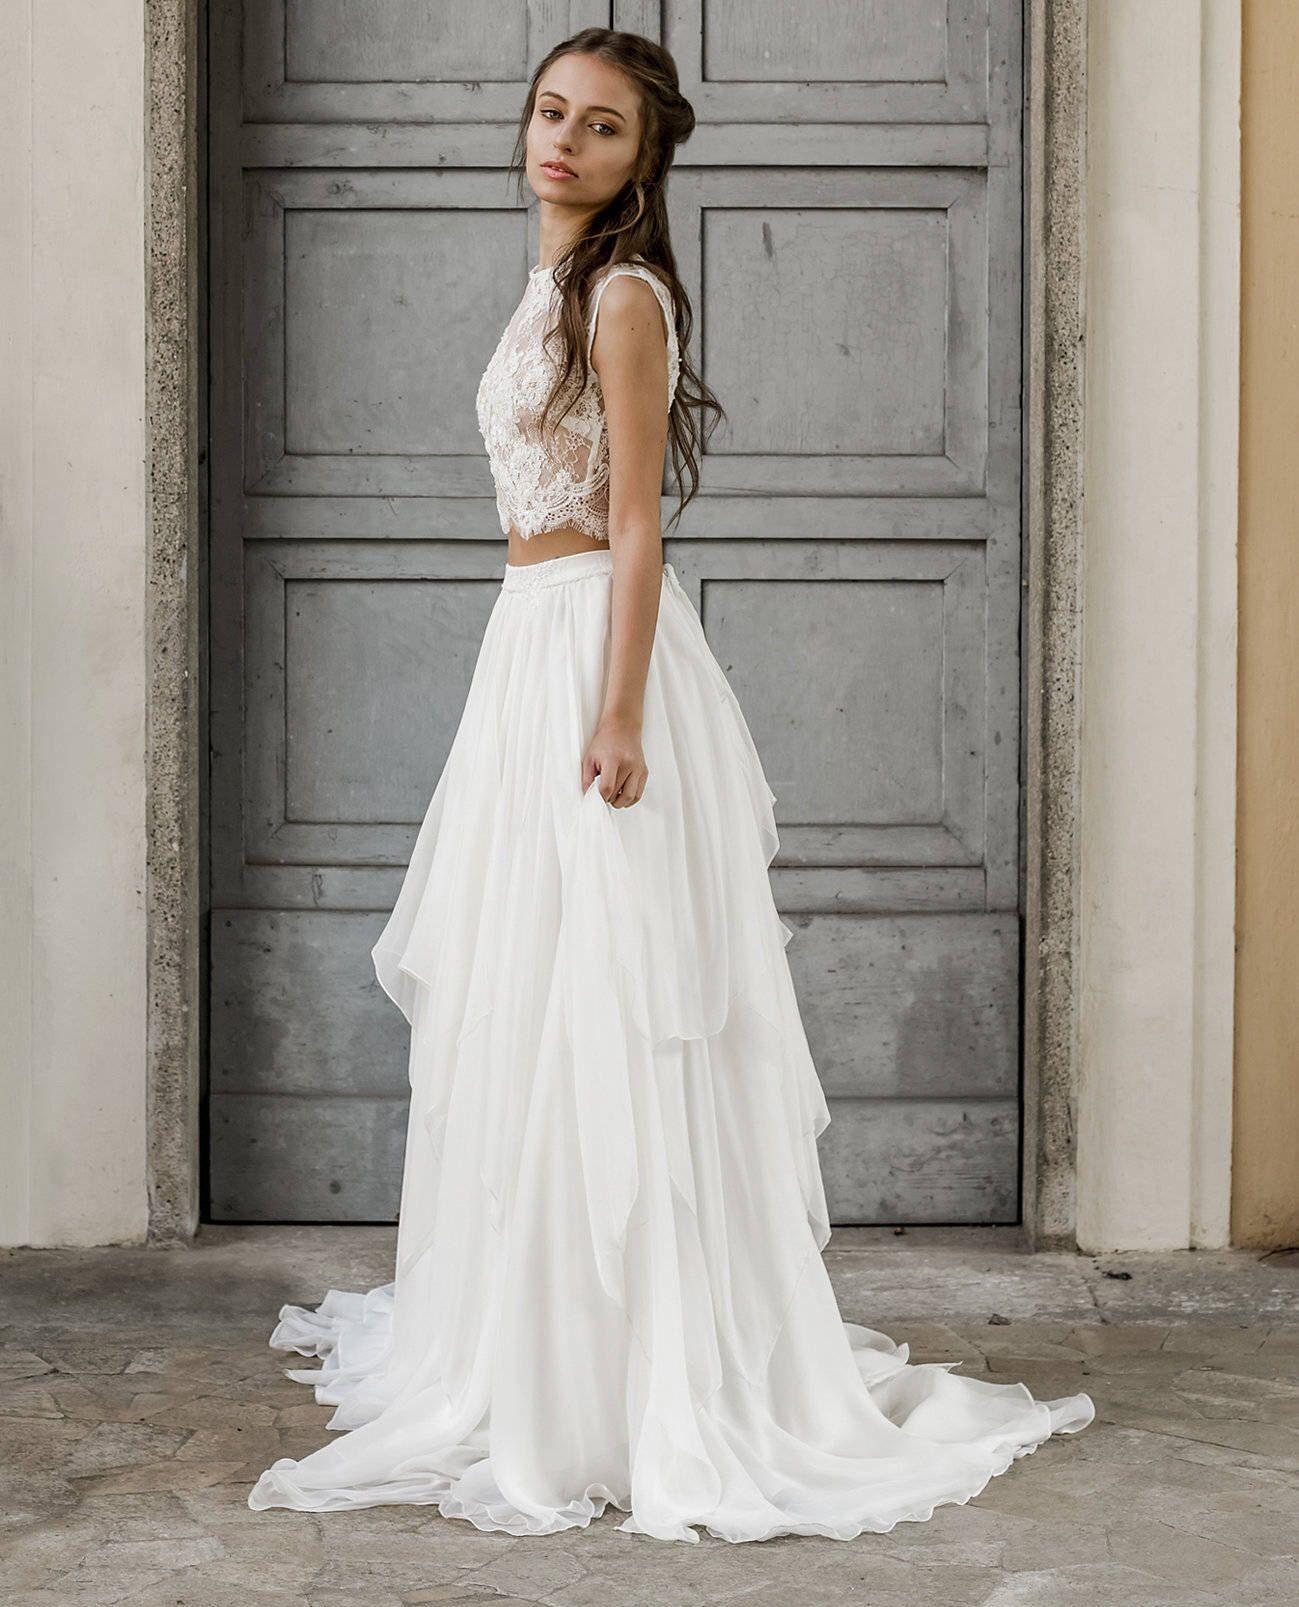 Silk and lace wedding separates bridal separates piece wedding